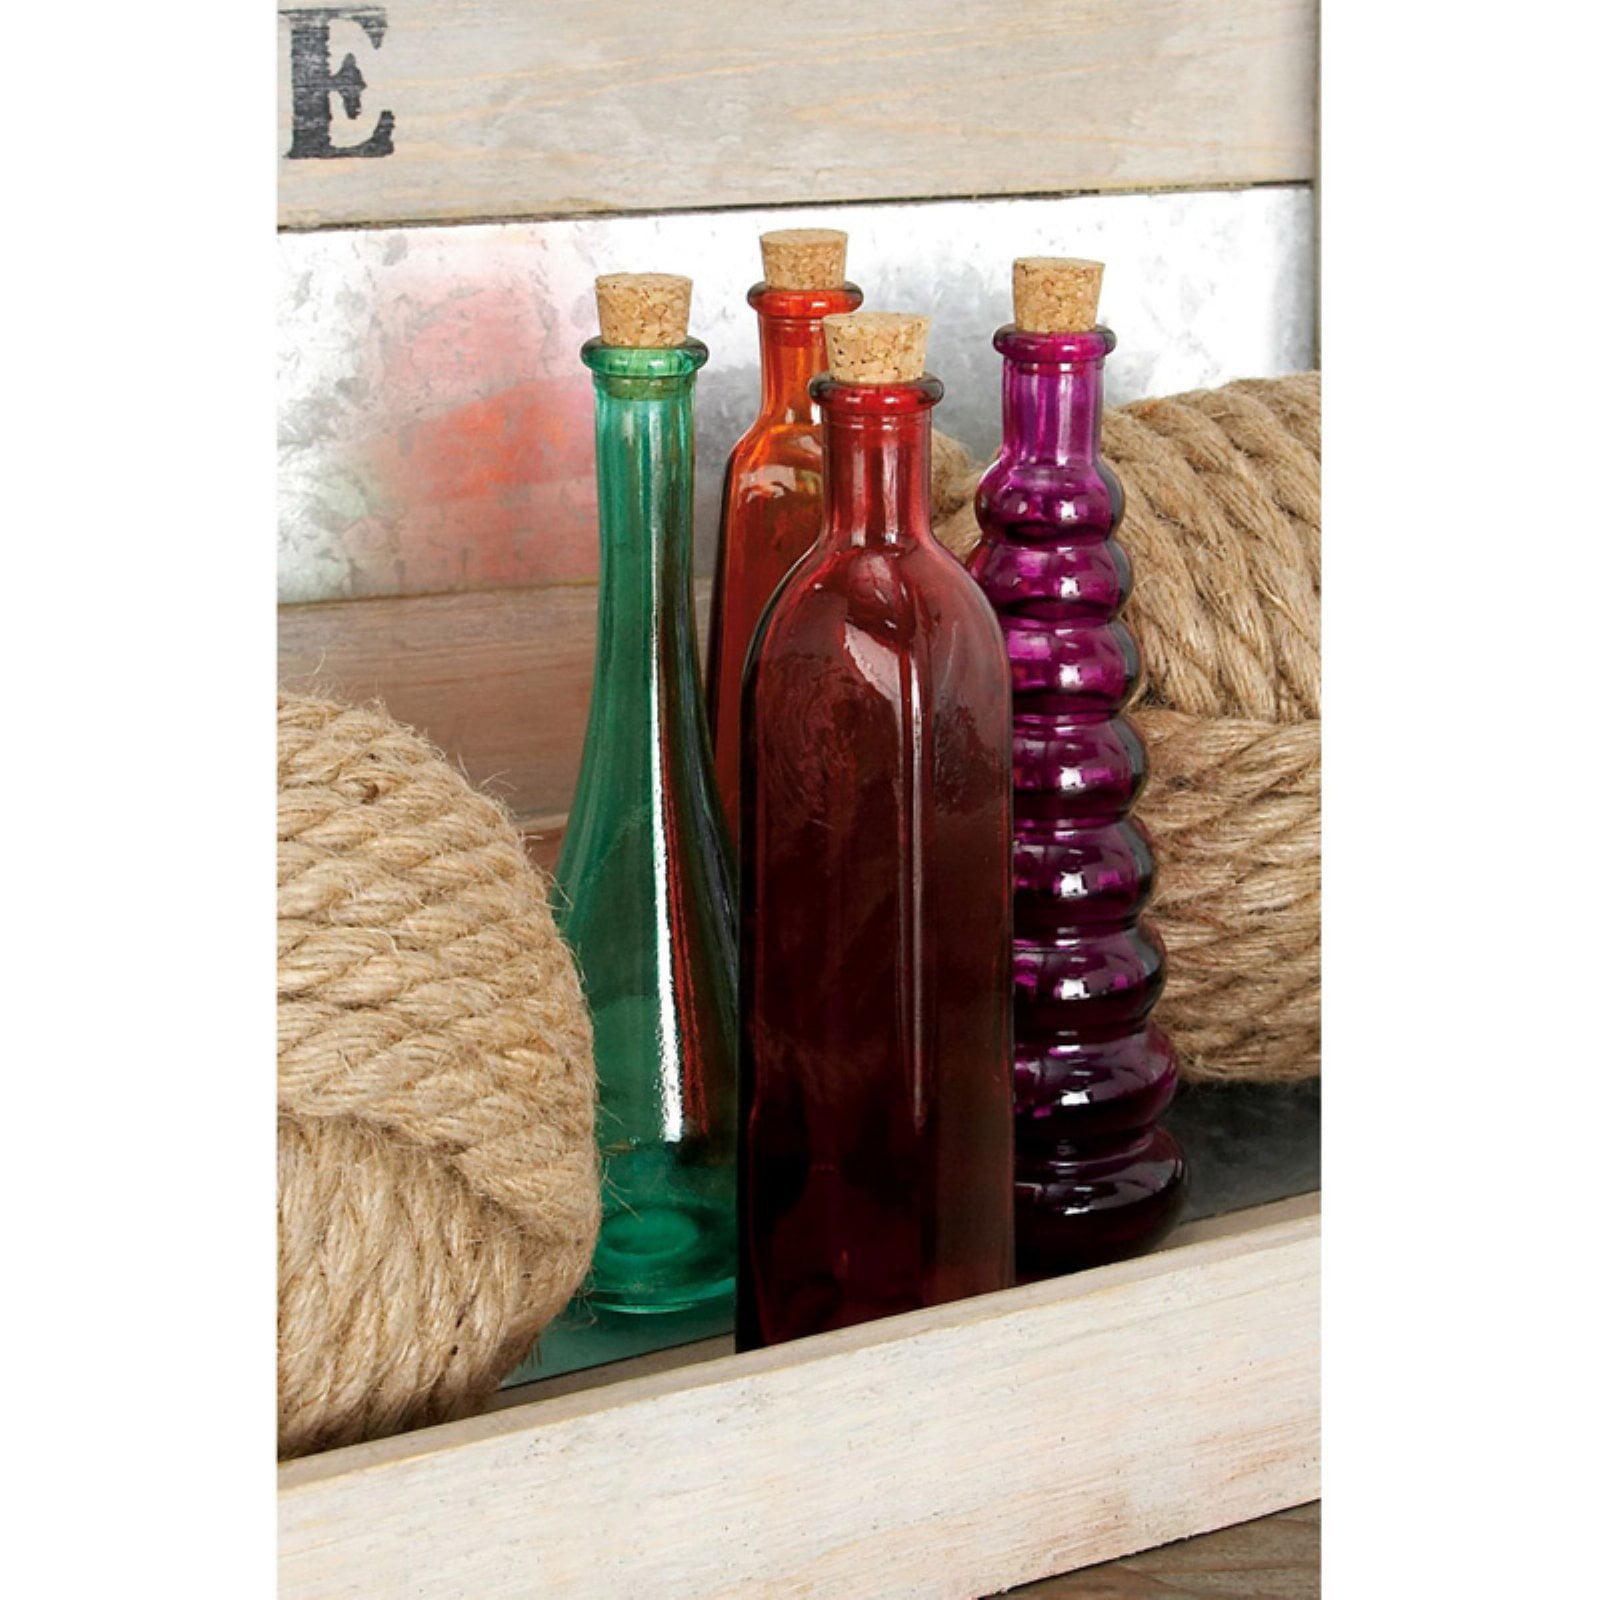 Decmode Glass Stopper Bottle, Set of 4, Multi Color